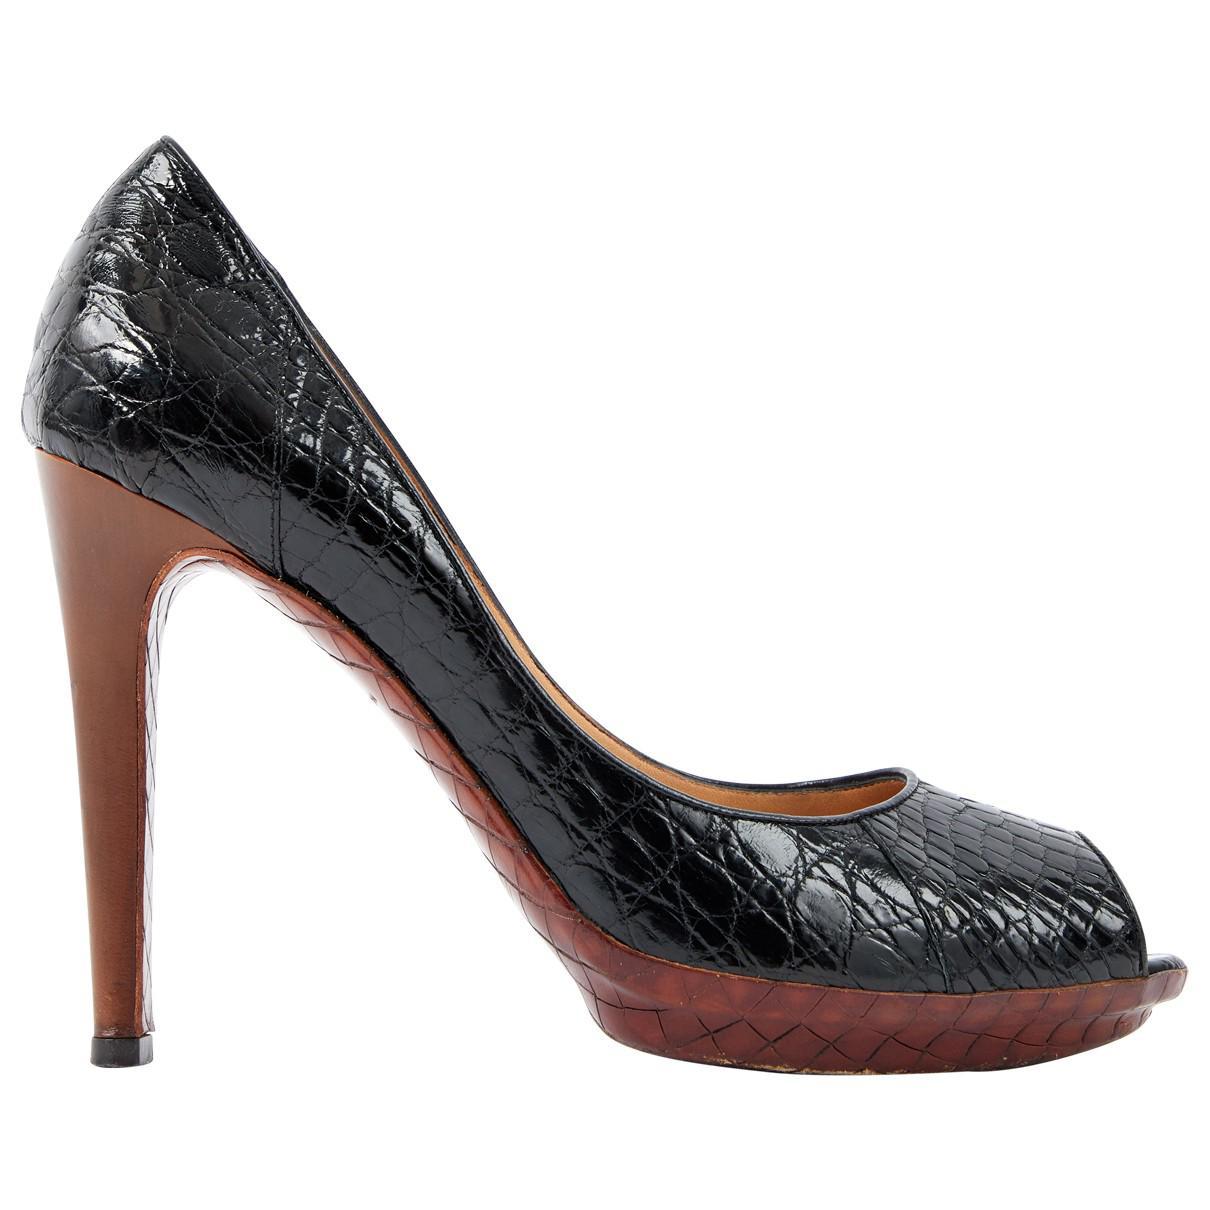 Pre-owned - Heels Bottega Veneta hZ4u7wMUs8